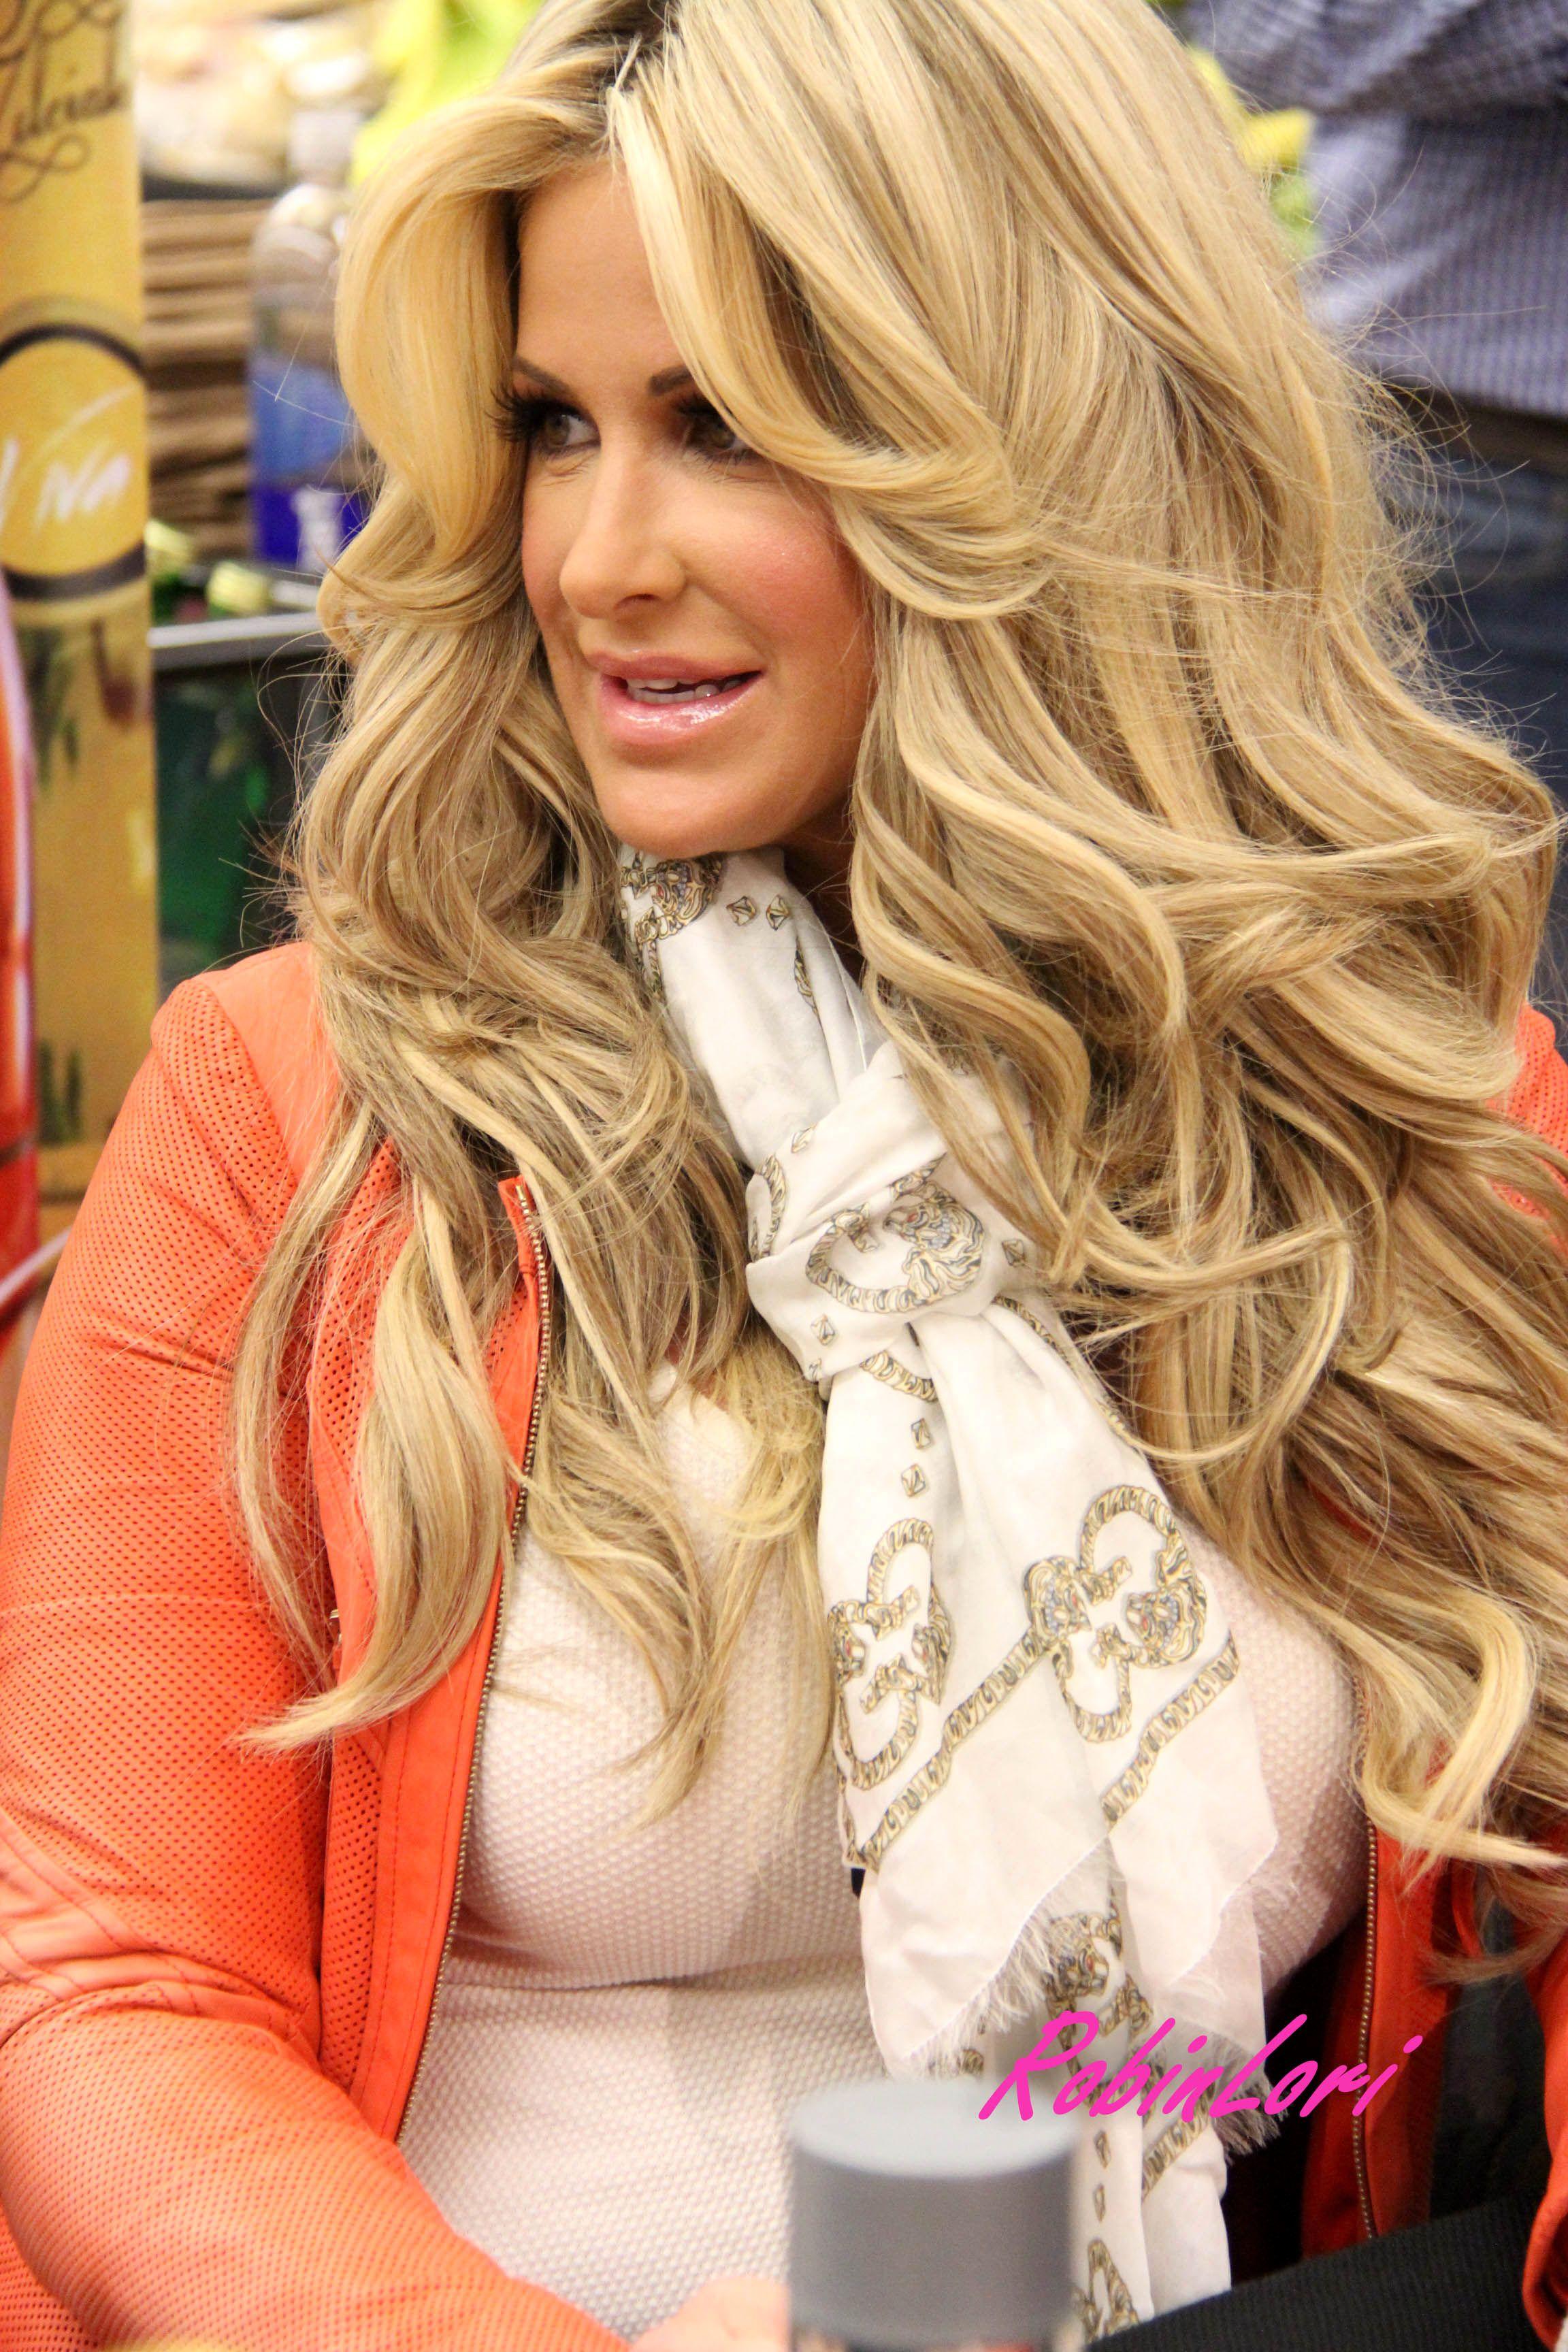 Pin By Trajana Wright On Holy Grail Kim Hair Long Hair Styles Kim Zolciak Biermann